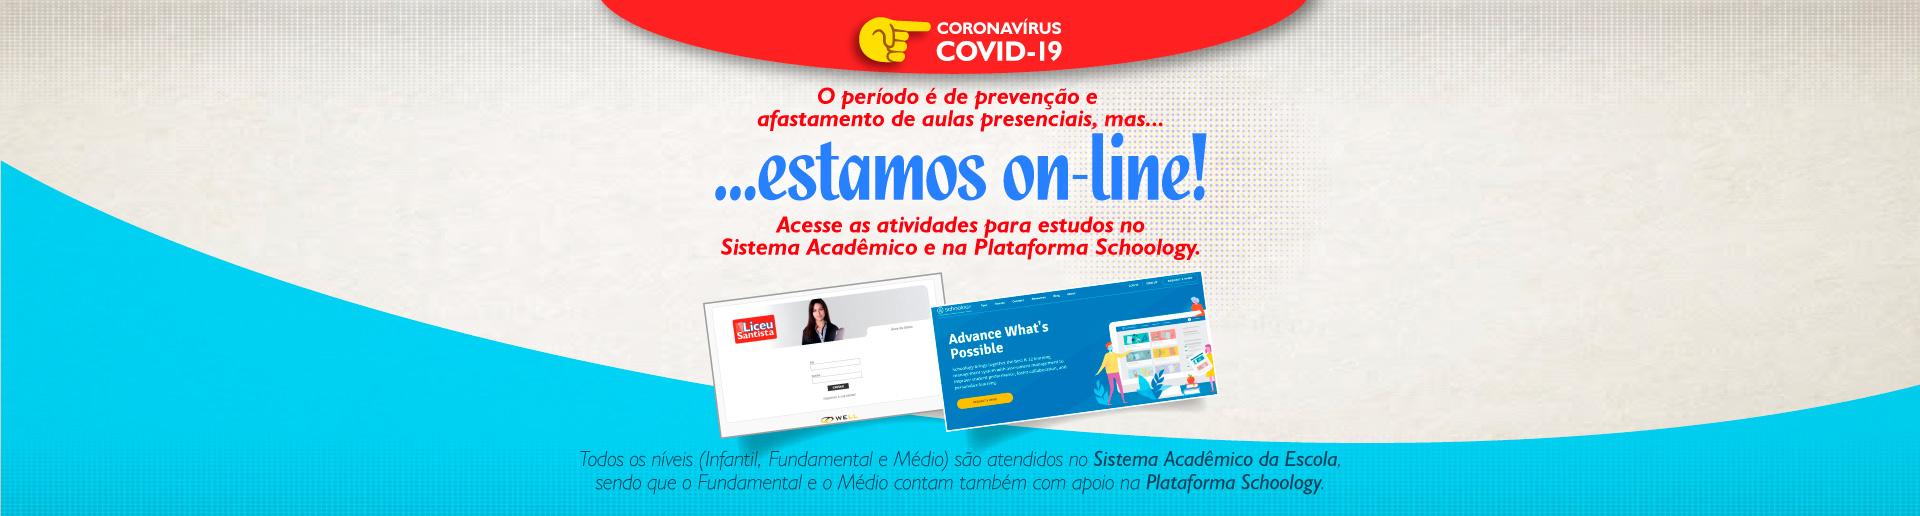 LS-Plataformas-On-line-Home-1920x516px-1